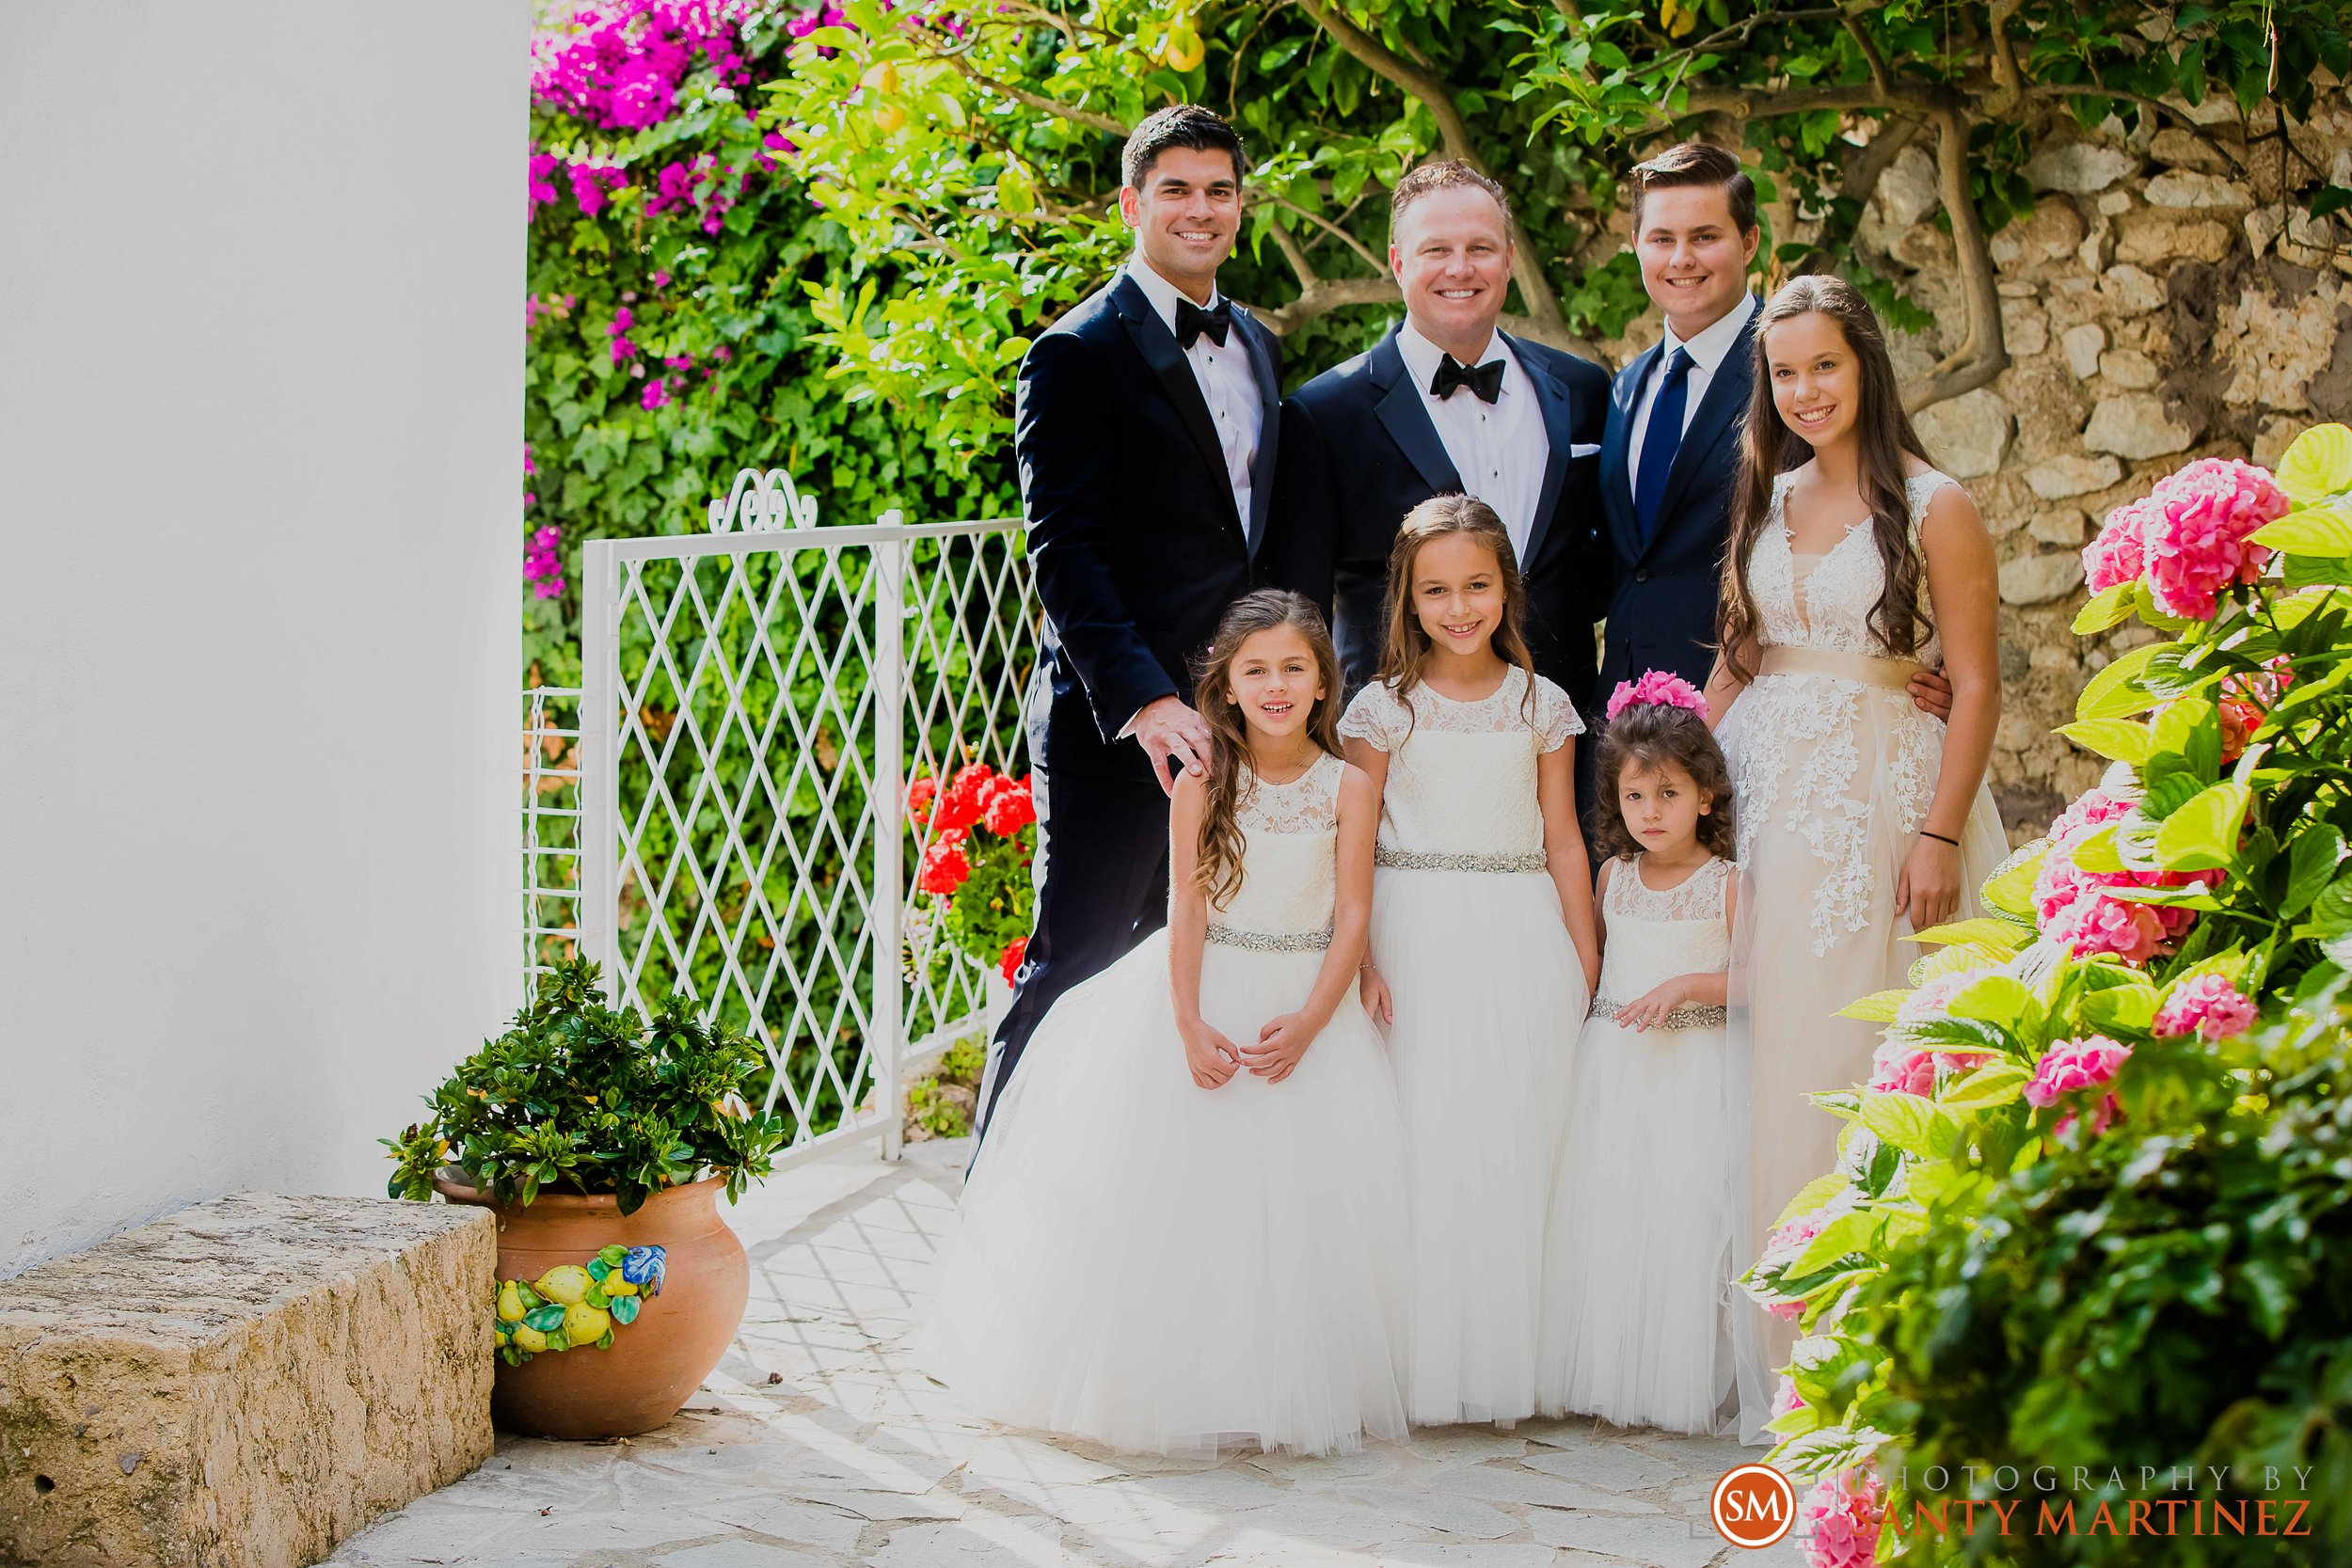 Wedding Capri Italy - Photography by Santy Martinez-21.jpg